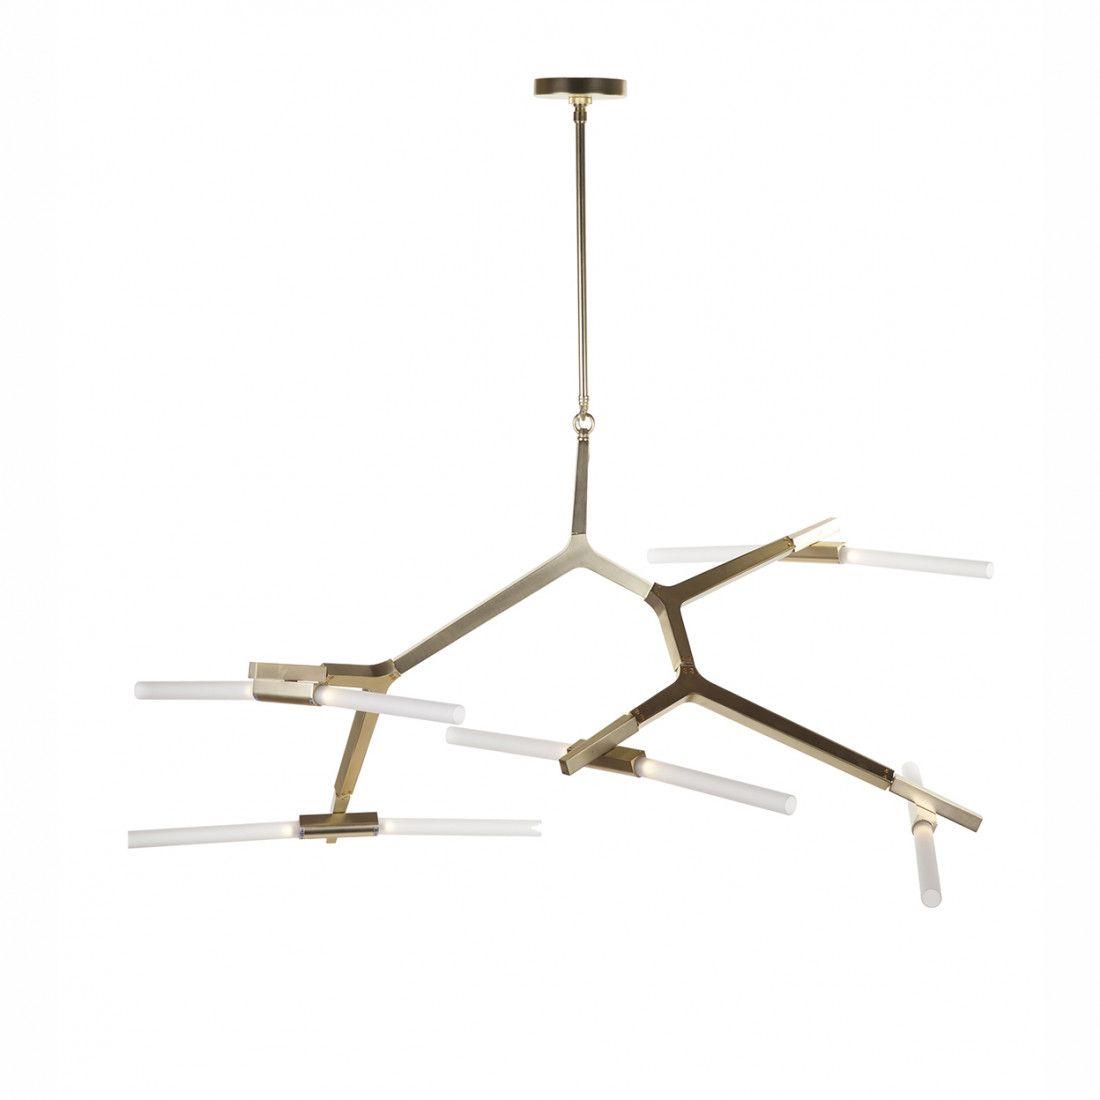 Anges Chandelier - Ten Bulb - Modern Branching Lamp | Bulbs ...